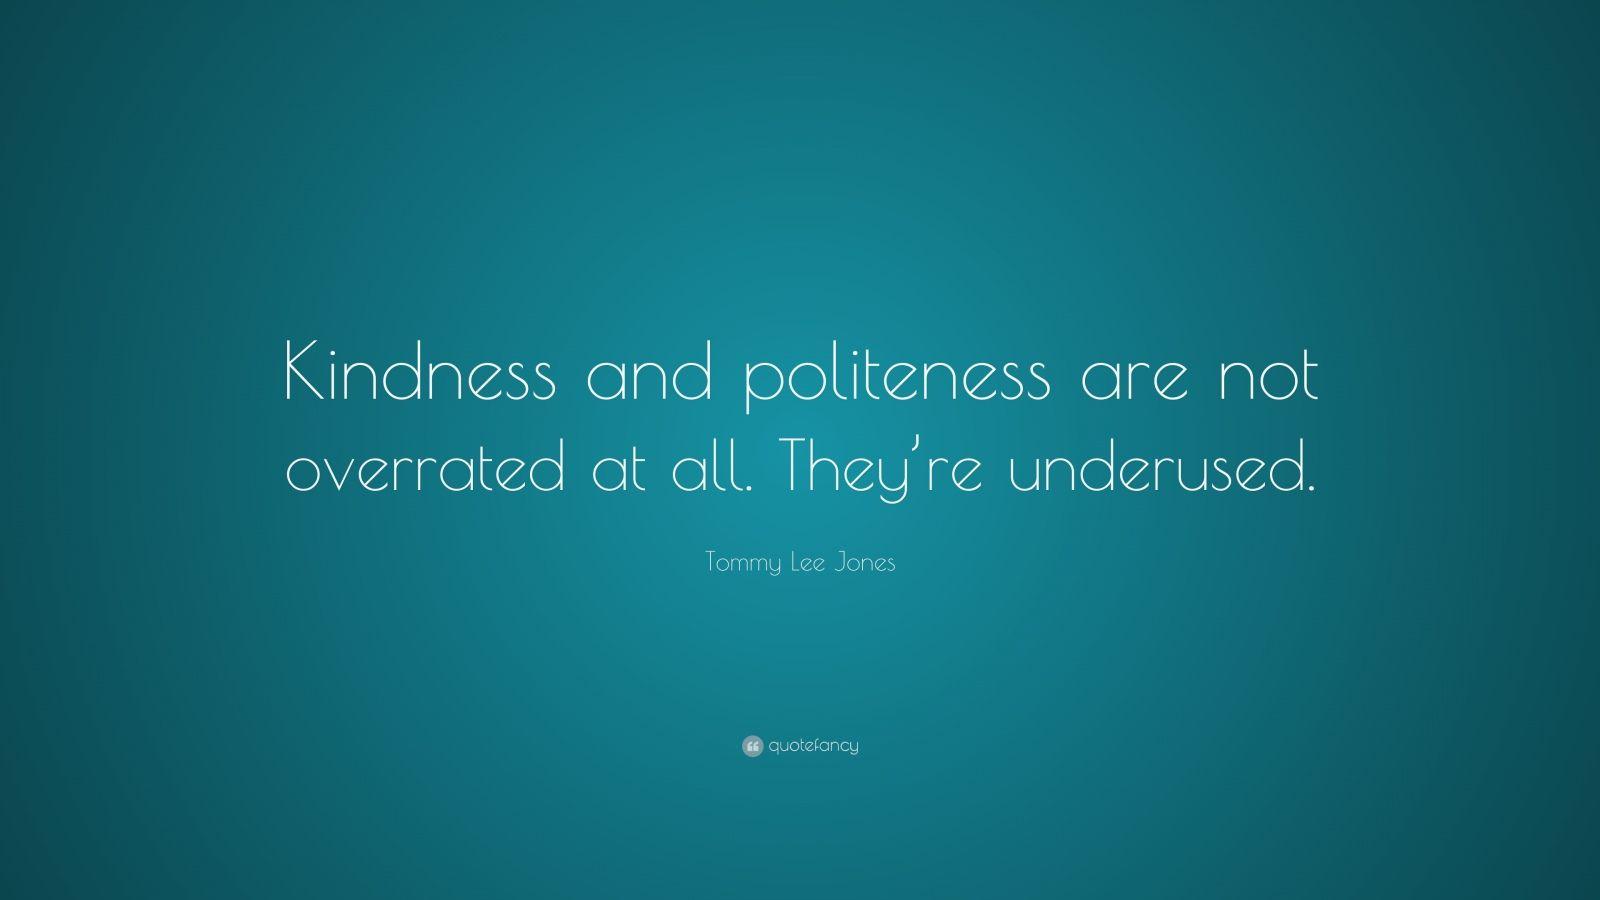 Tommy Lee Jones Quotes (42 wallpapers) - Quotefancy | 1600 x 900 jpeg 41kB